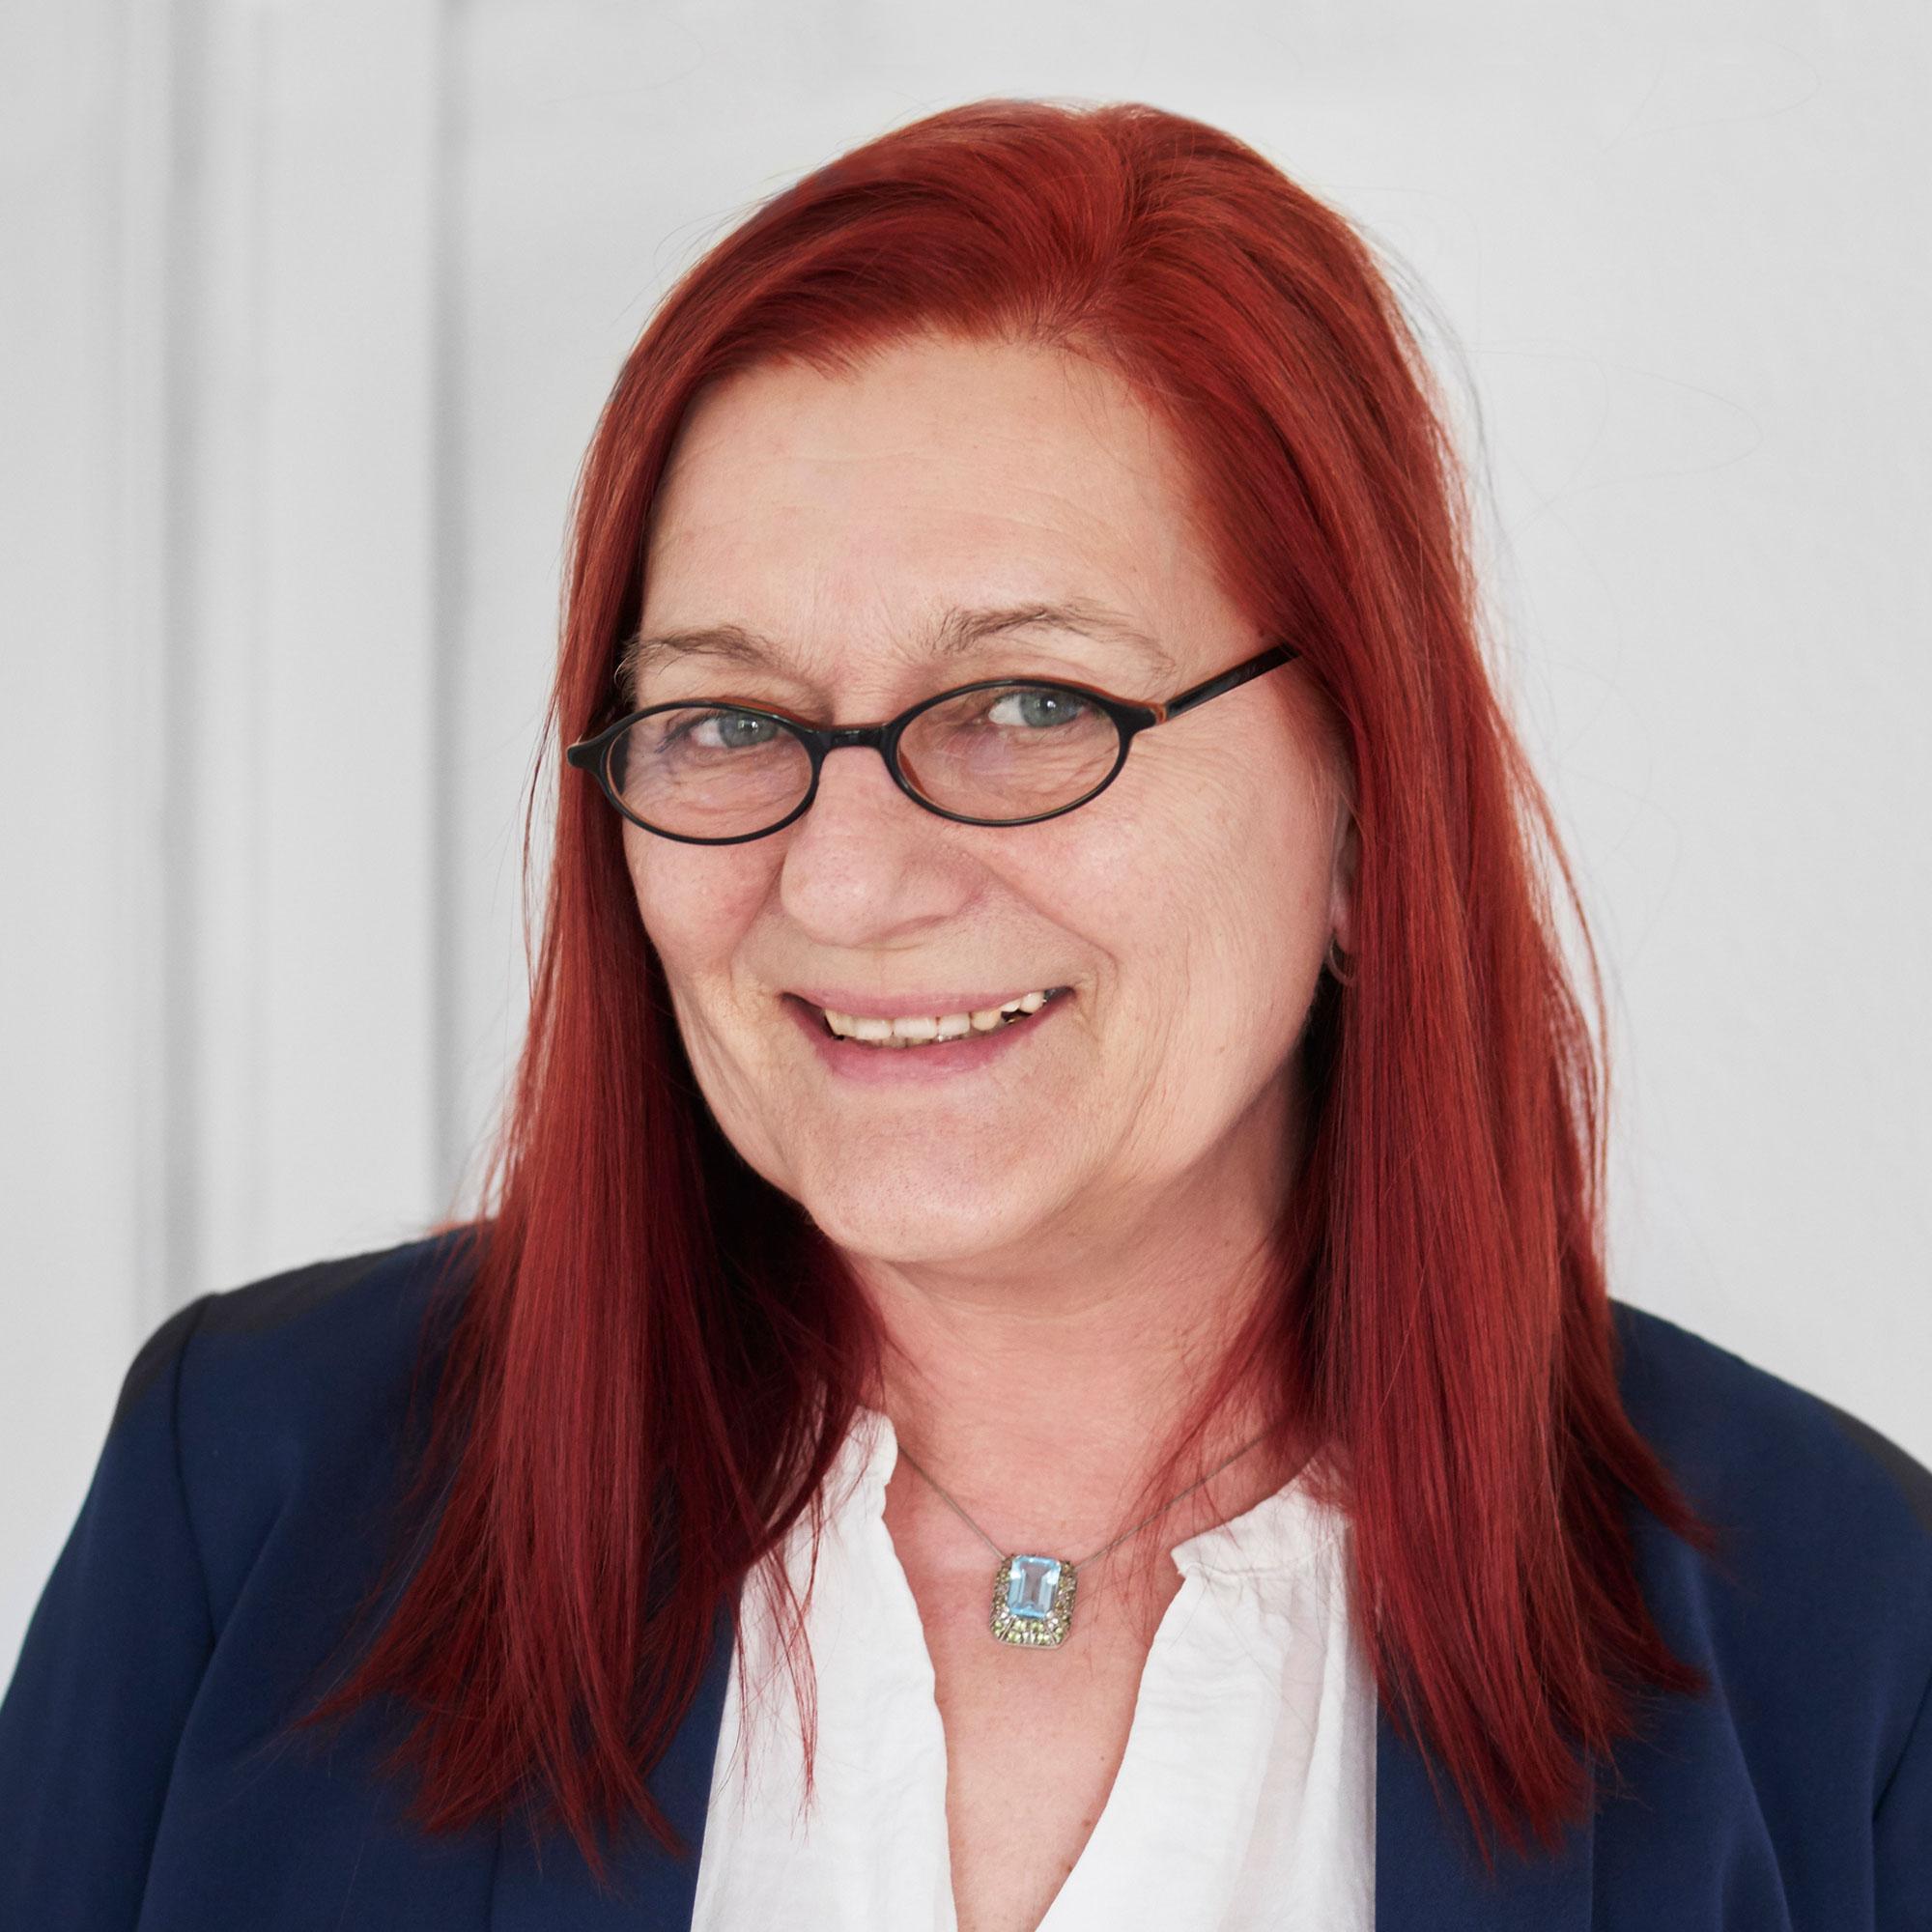 Martina Hahn